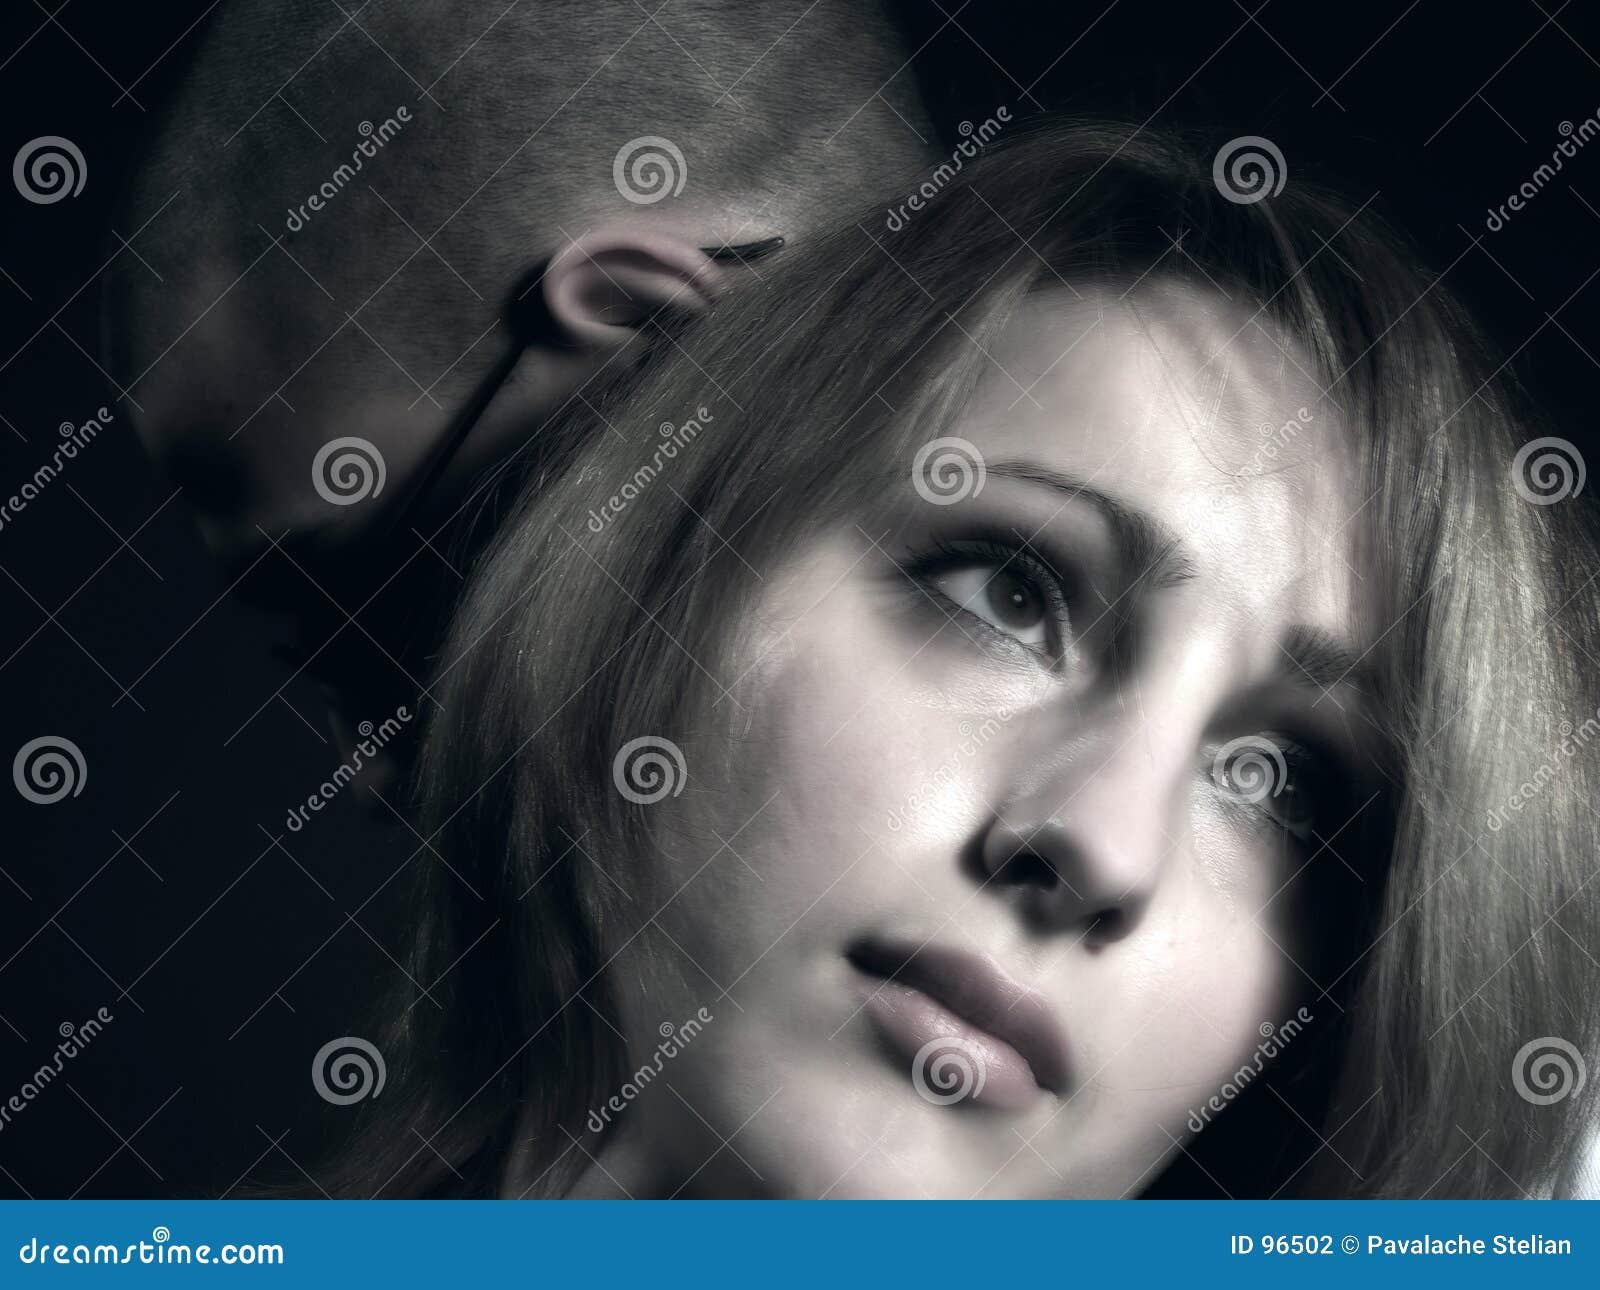 Sad couple with young girl and boy 2